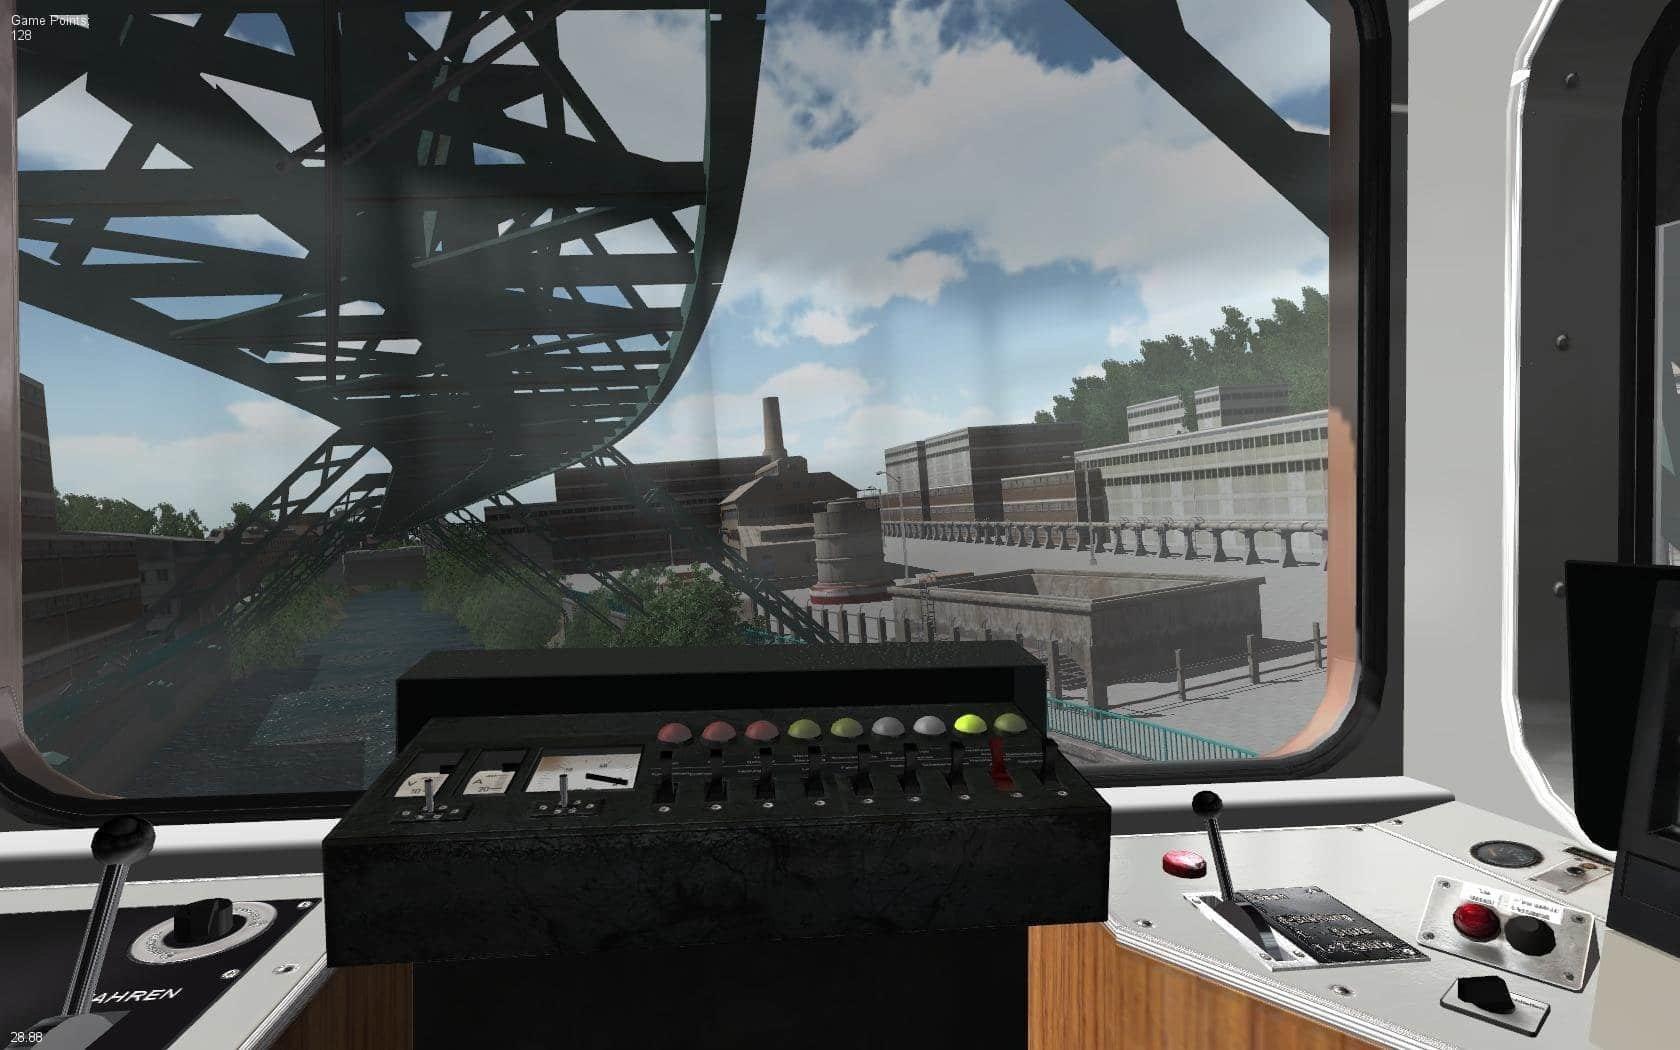 Schwebebahn-Simulator